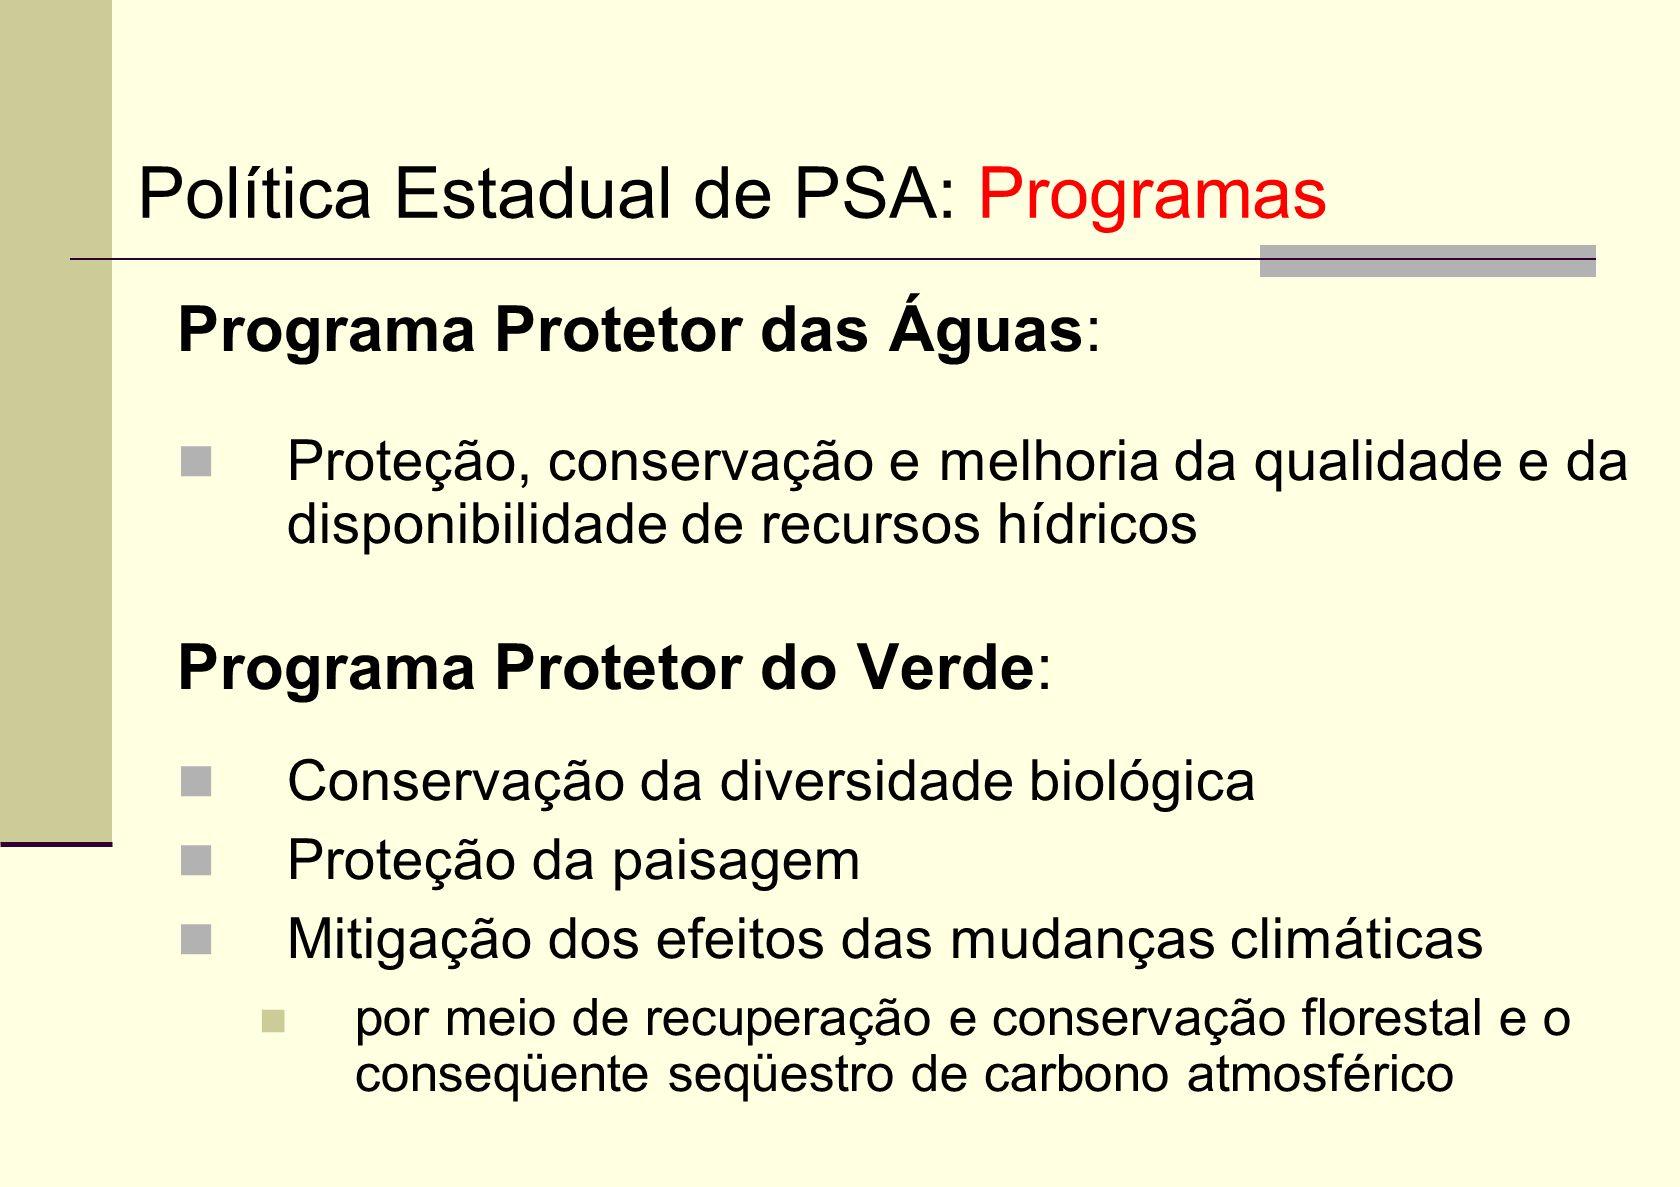 Política Estadual de PSA: Programas